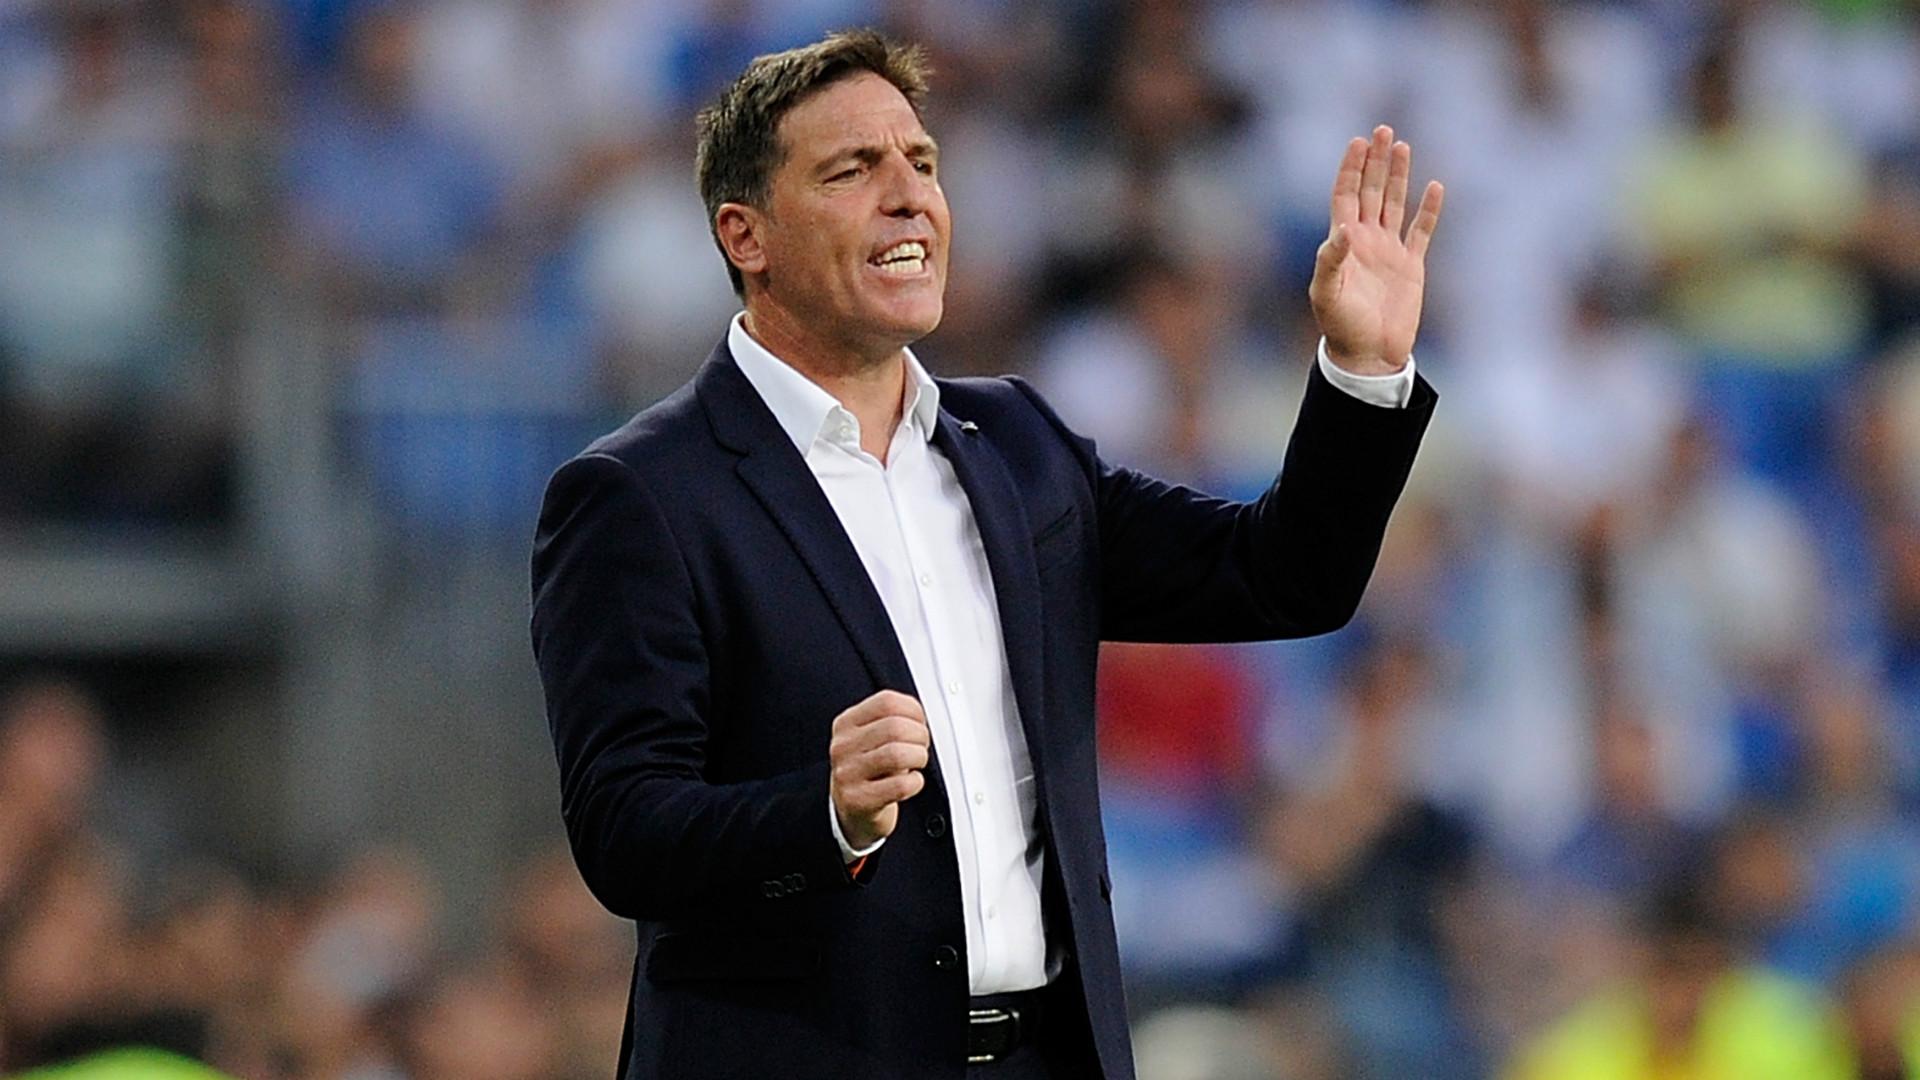 Celta Vigo coach Eduardo Berizzo to leave Spanish club